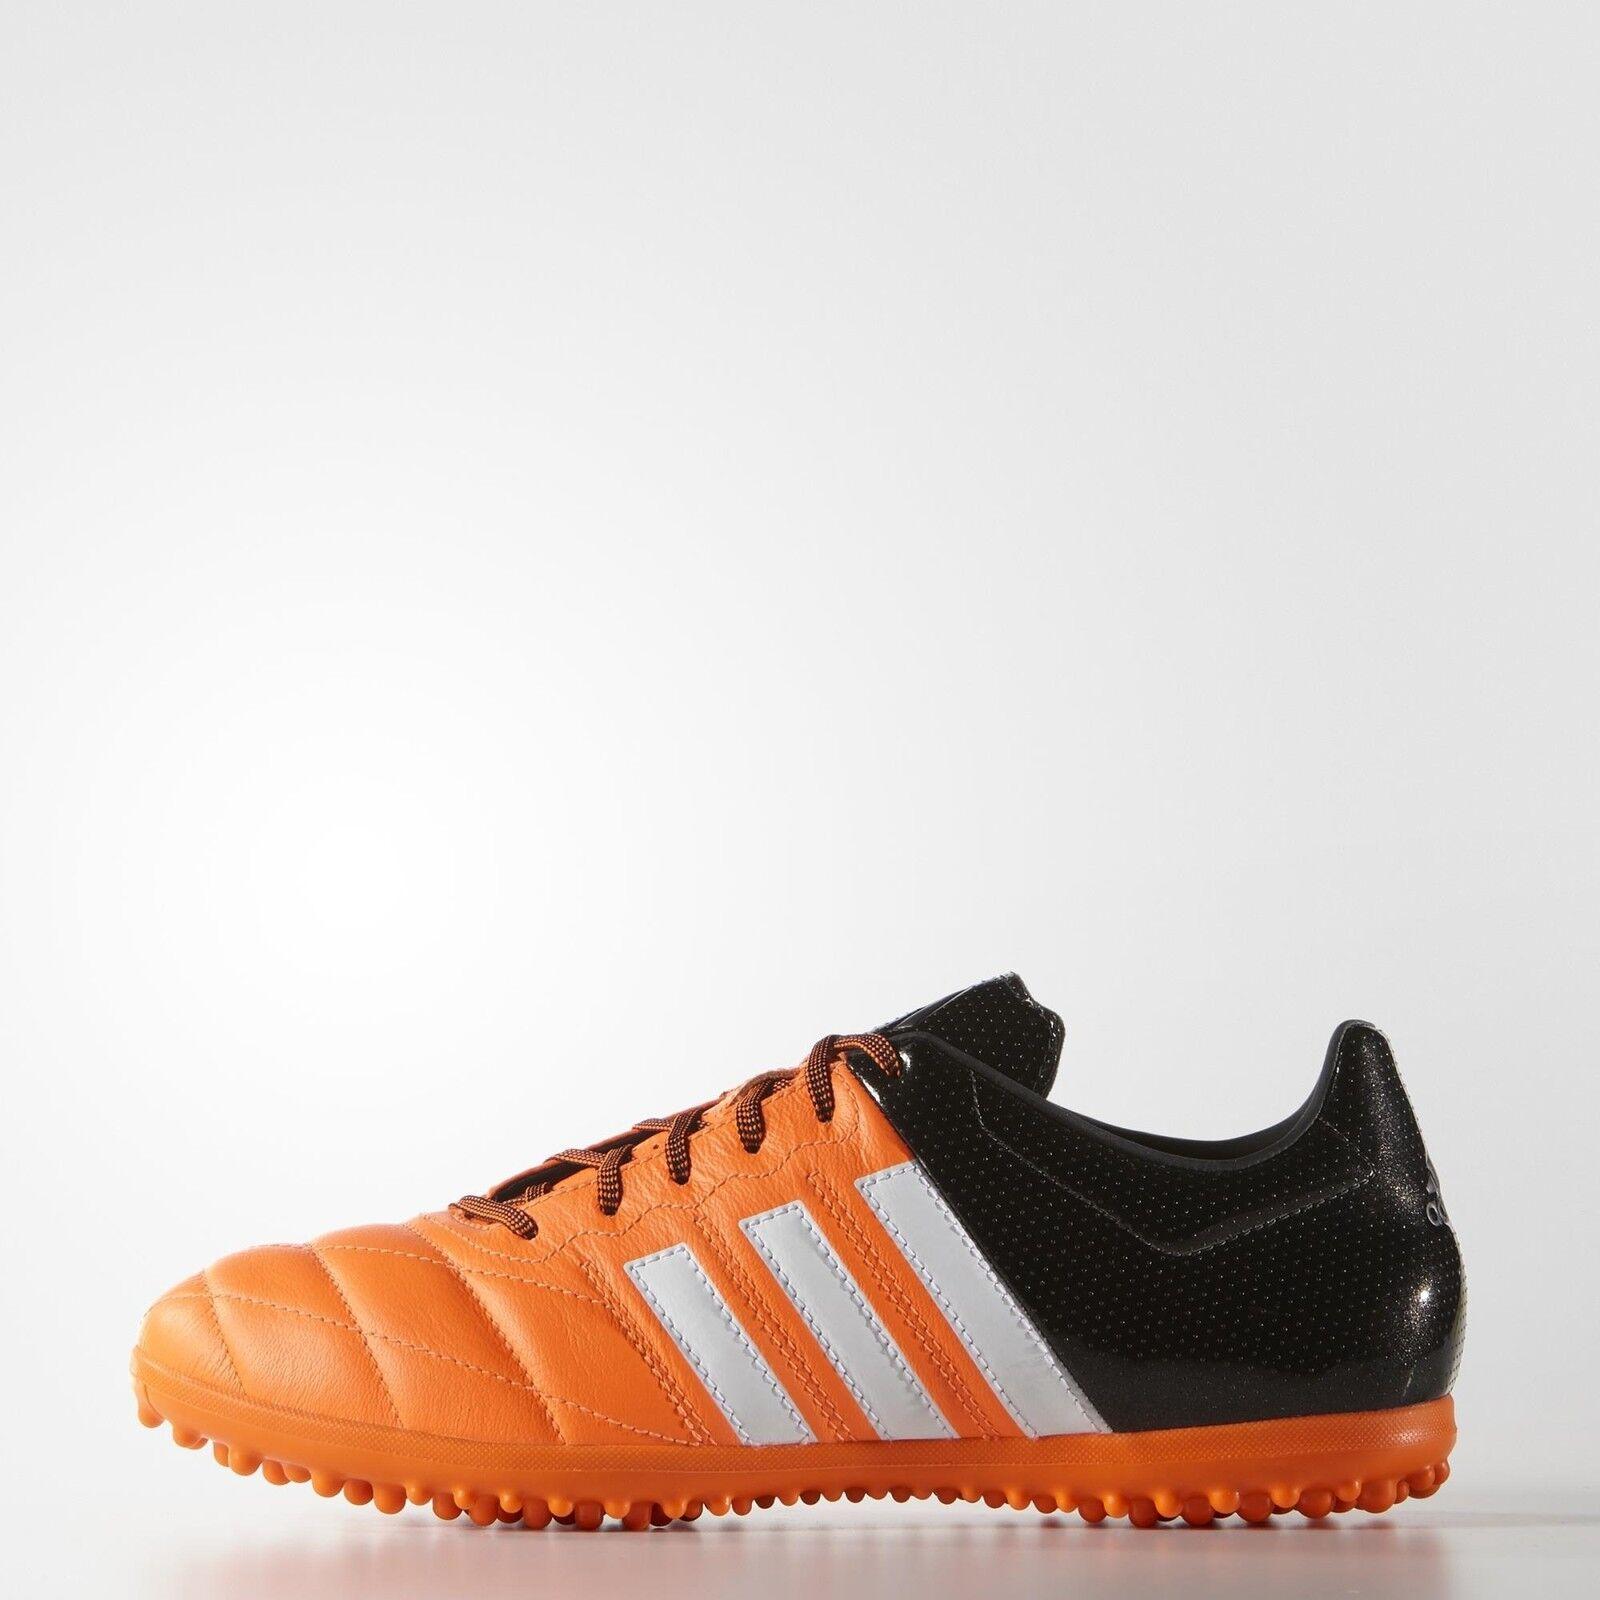 FOOTBALL scarpe SCARPE CALCETTO ADIDAS ACE 15.3 TF LEATHER PELLE B27064 MISURA 45